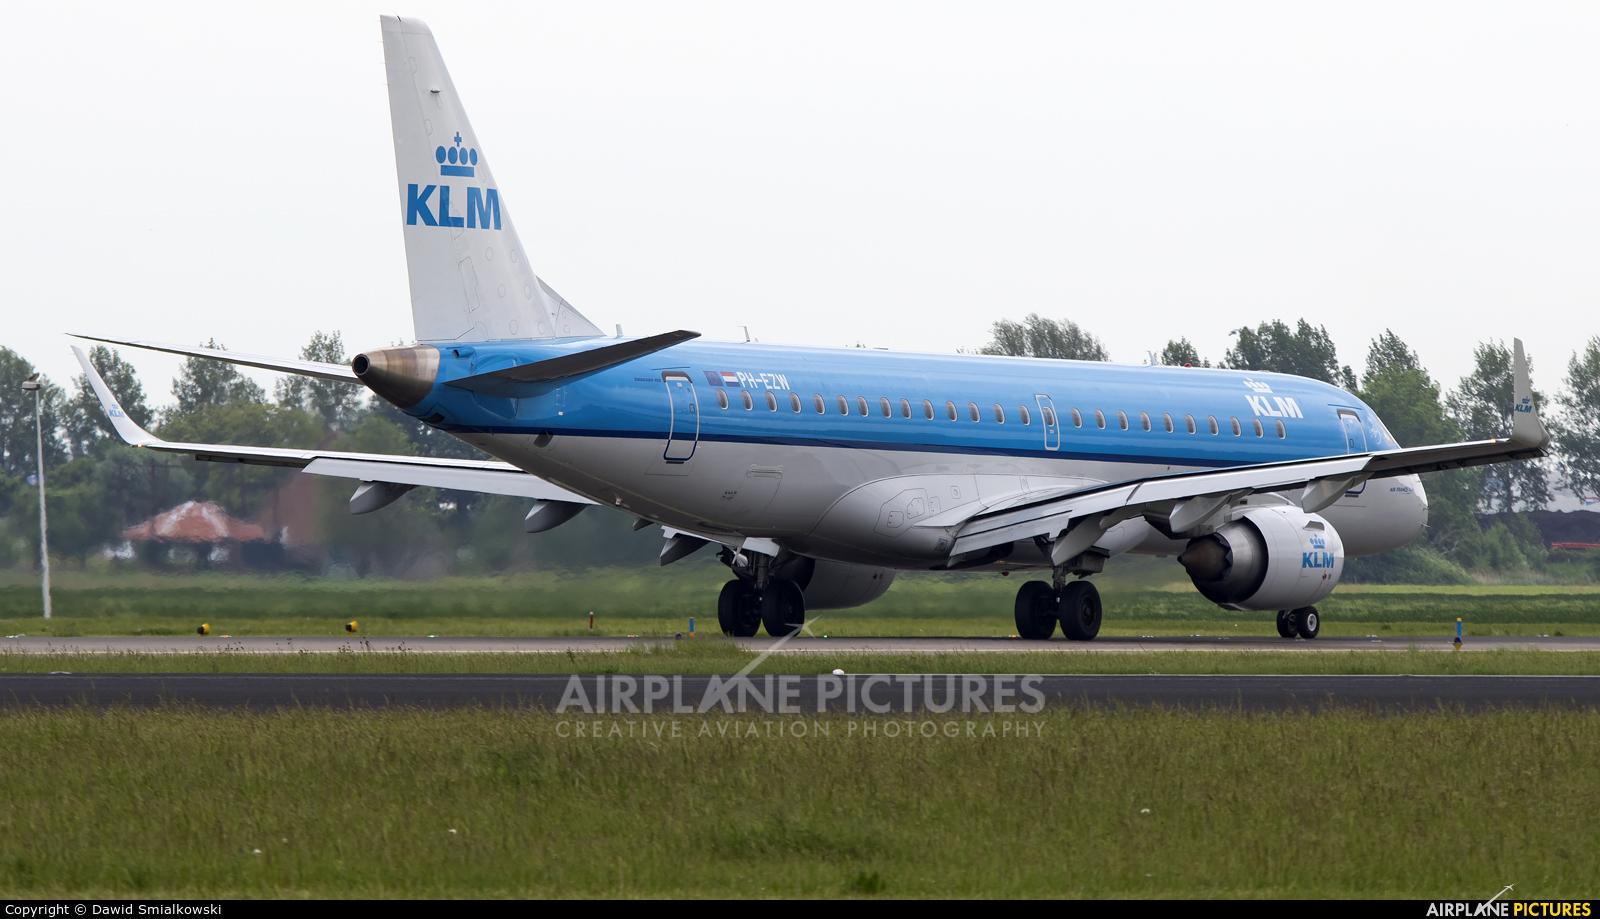 KLM Cityhopper PH-EZW aircraft at Amsterdam - Schiphol